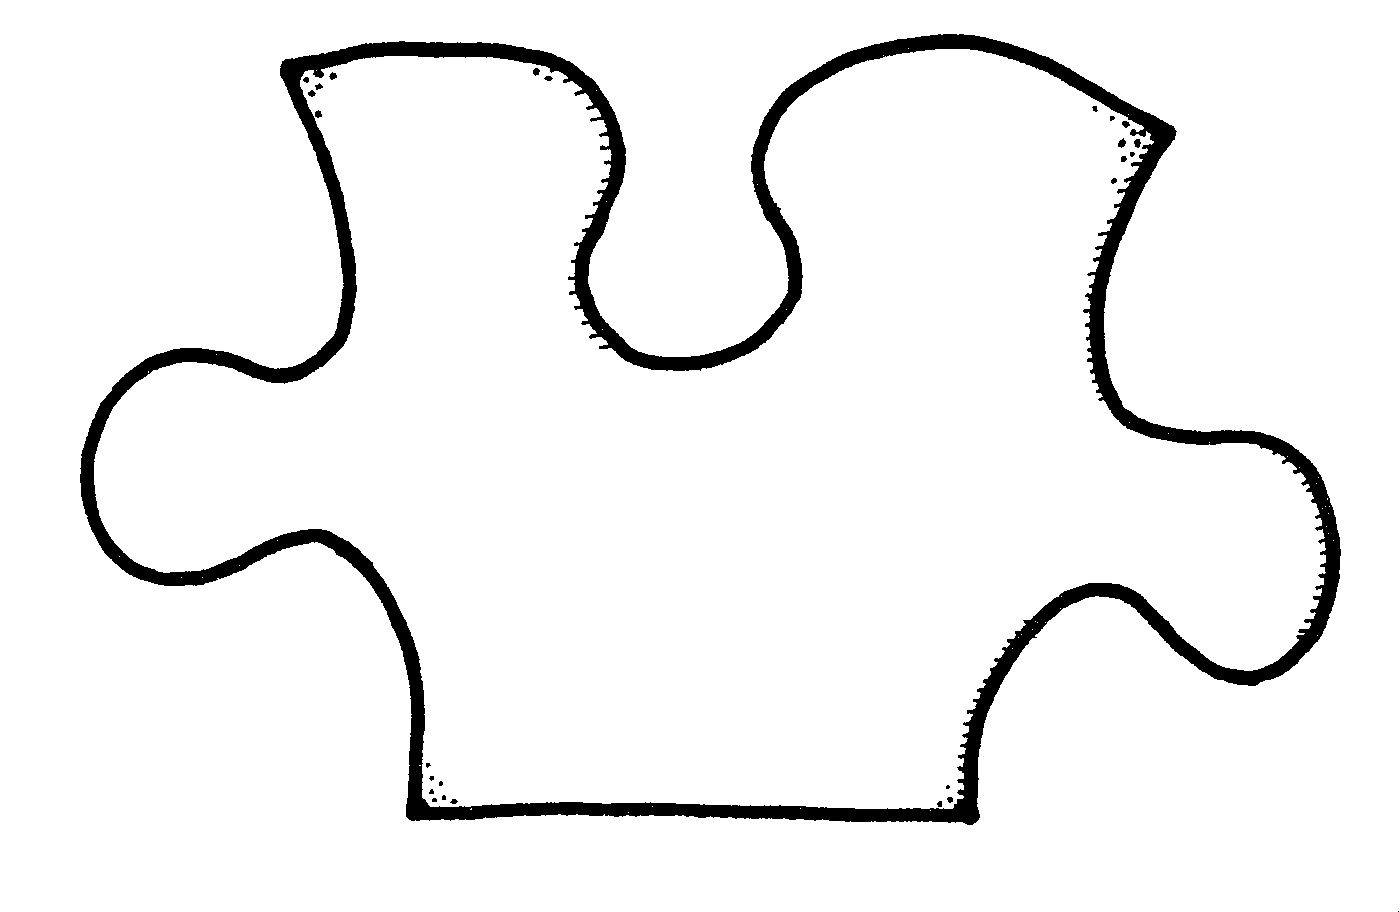 Puzzle Piece Image